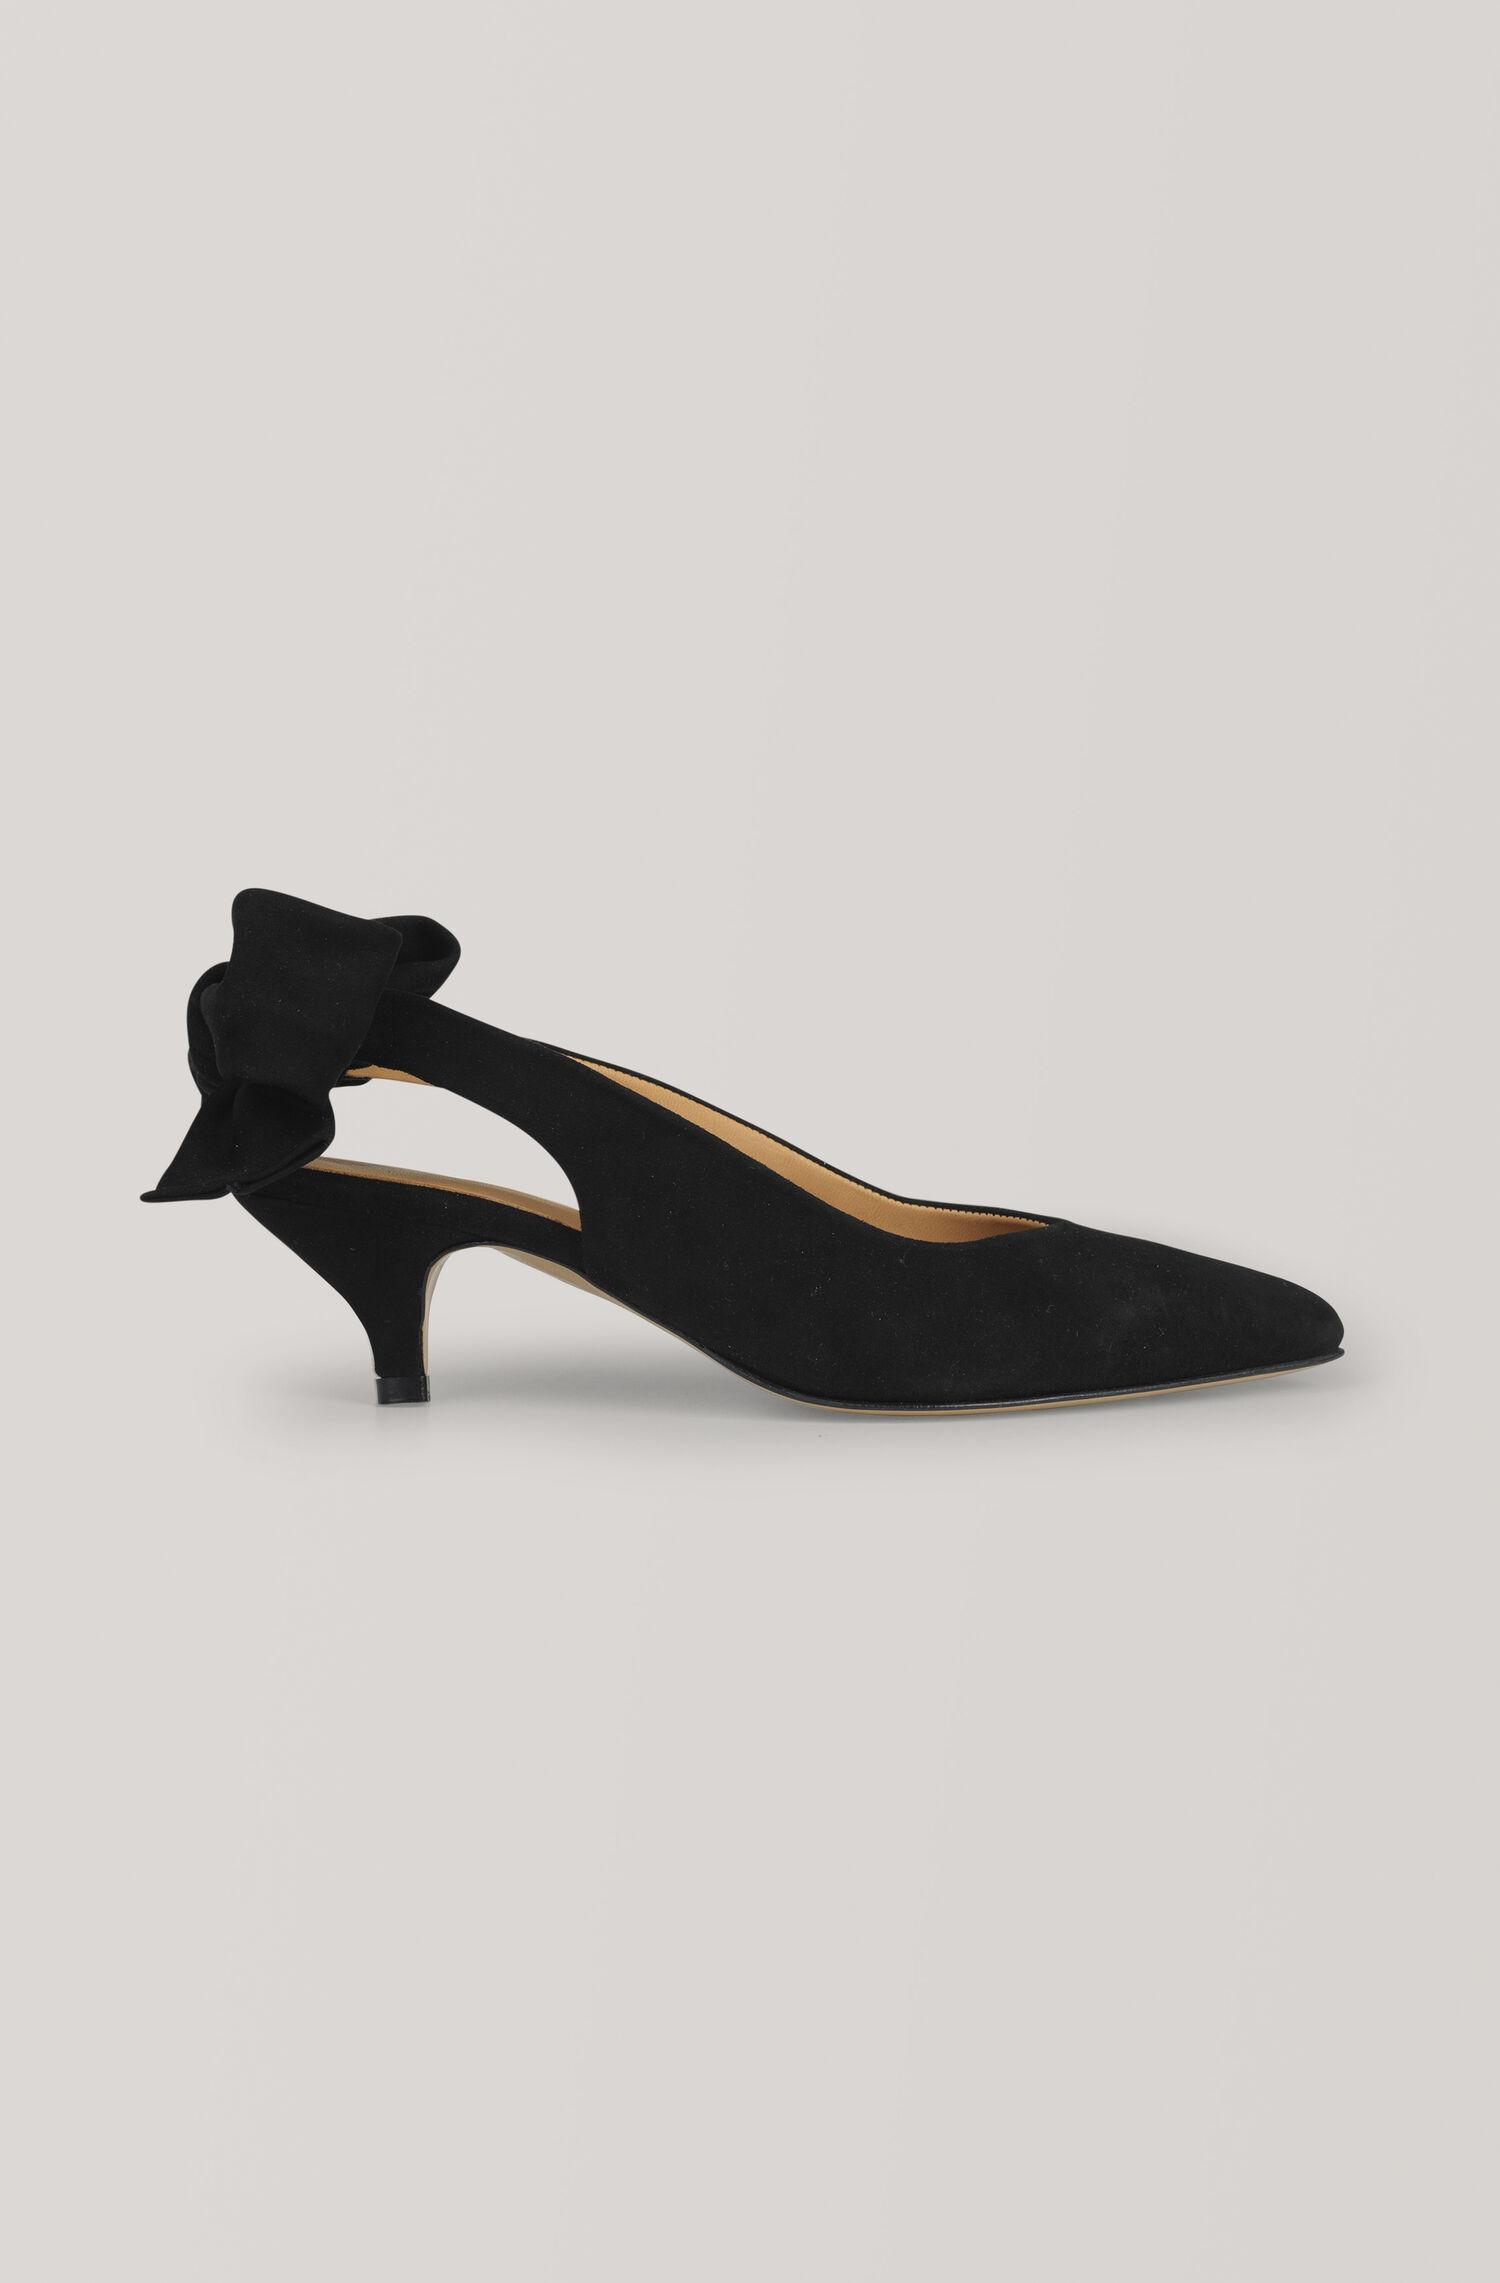 hot sale online separation shoes reasonable price Bow Kitten Heel Pumps